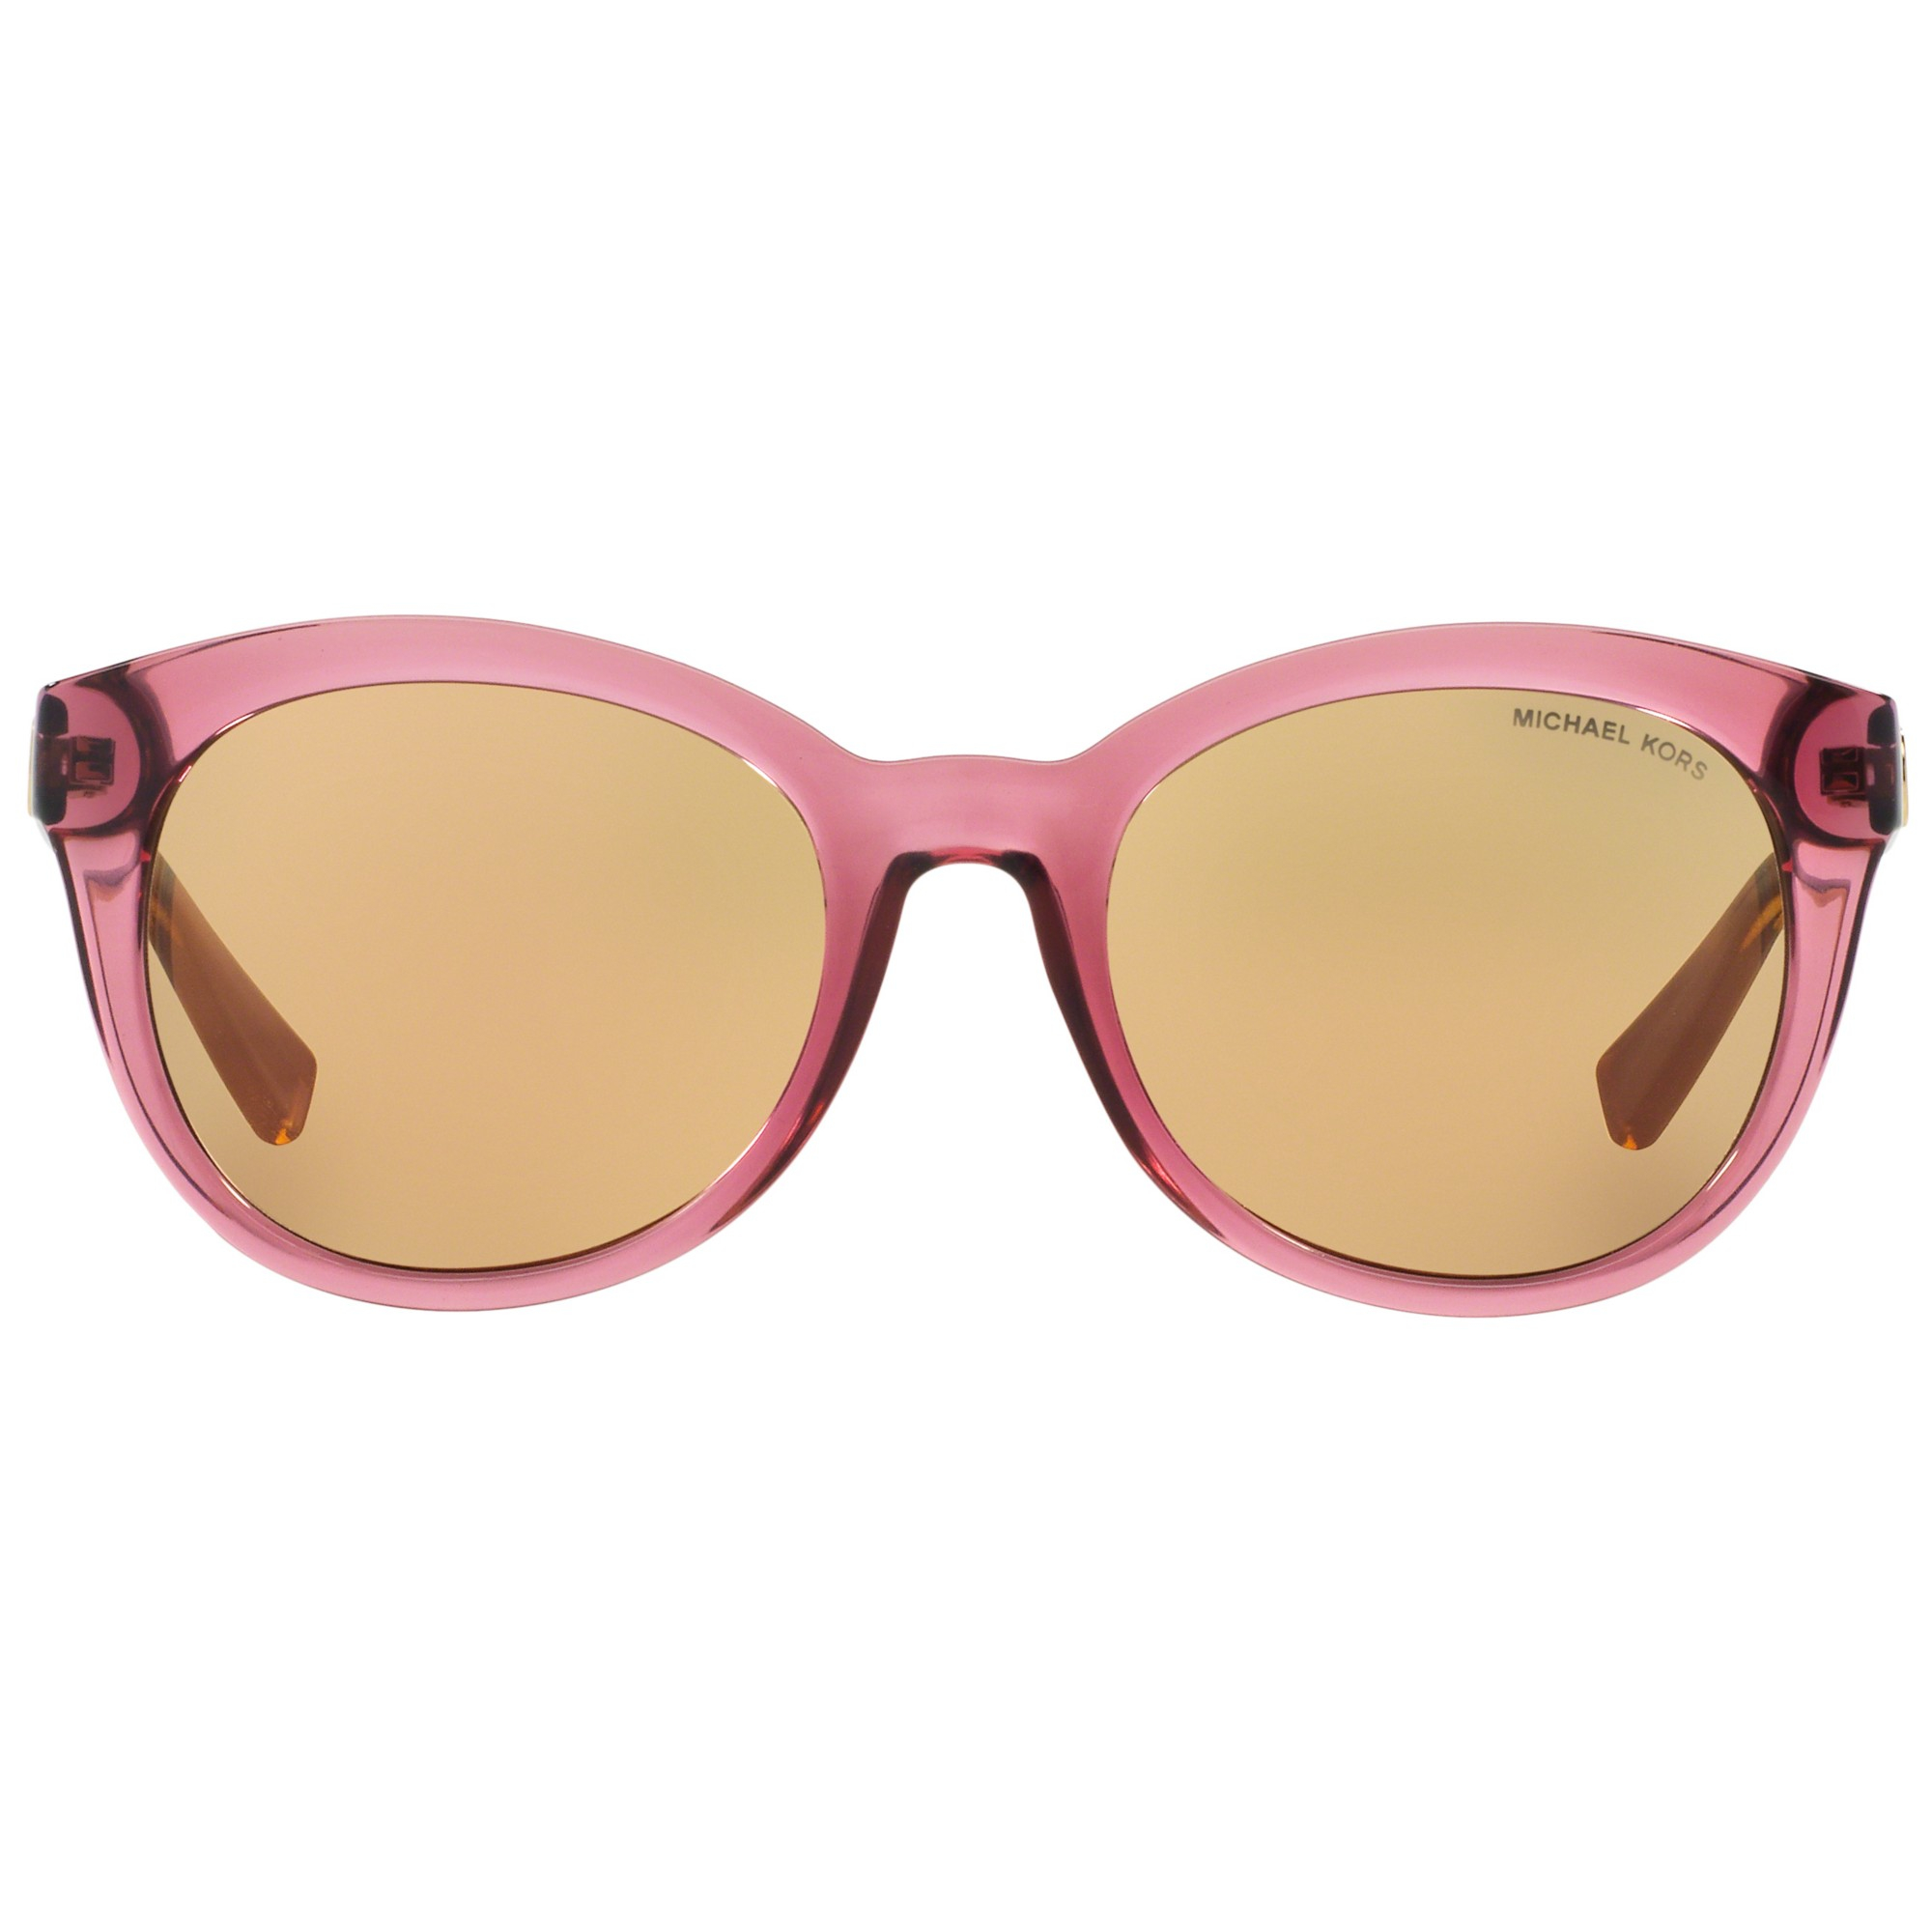 abd2d9d3b4fde Michael Kors Mk6019 Champagne Beach Sunglasses in Pink - Lyst